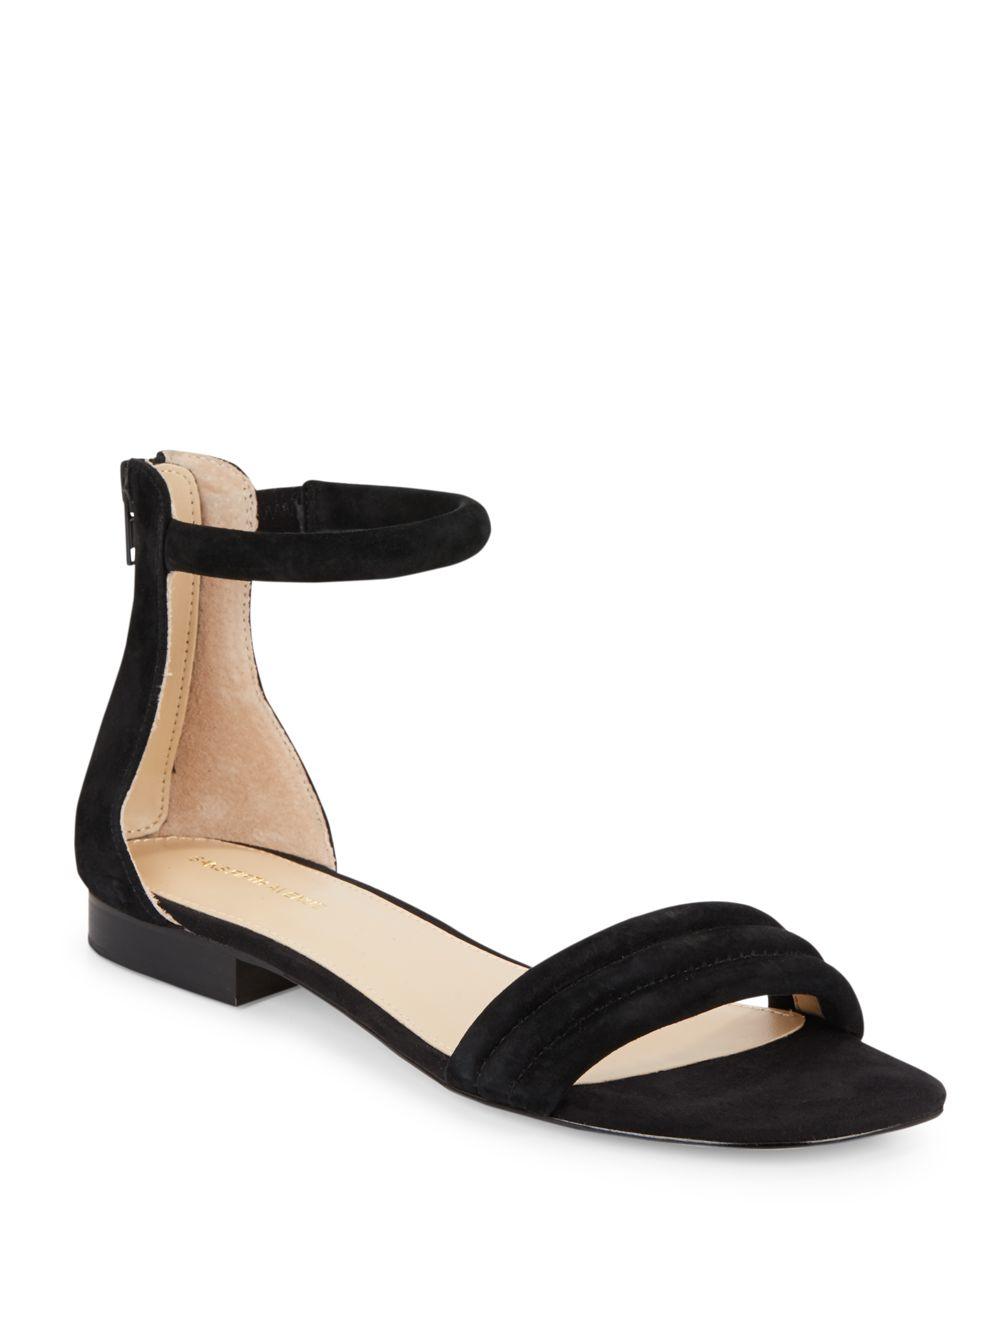 990fefd16e30 Lyst - Saks Fifth Avenue Celine Suede Ankle Strap Sandals in Black